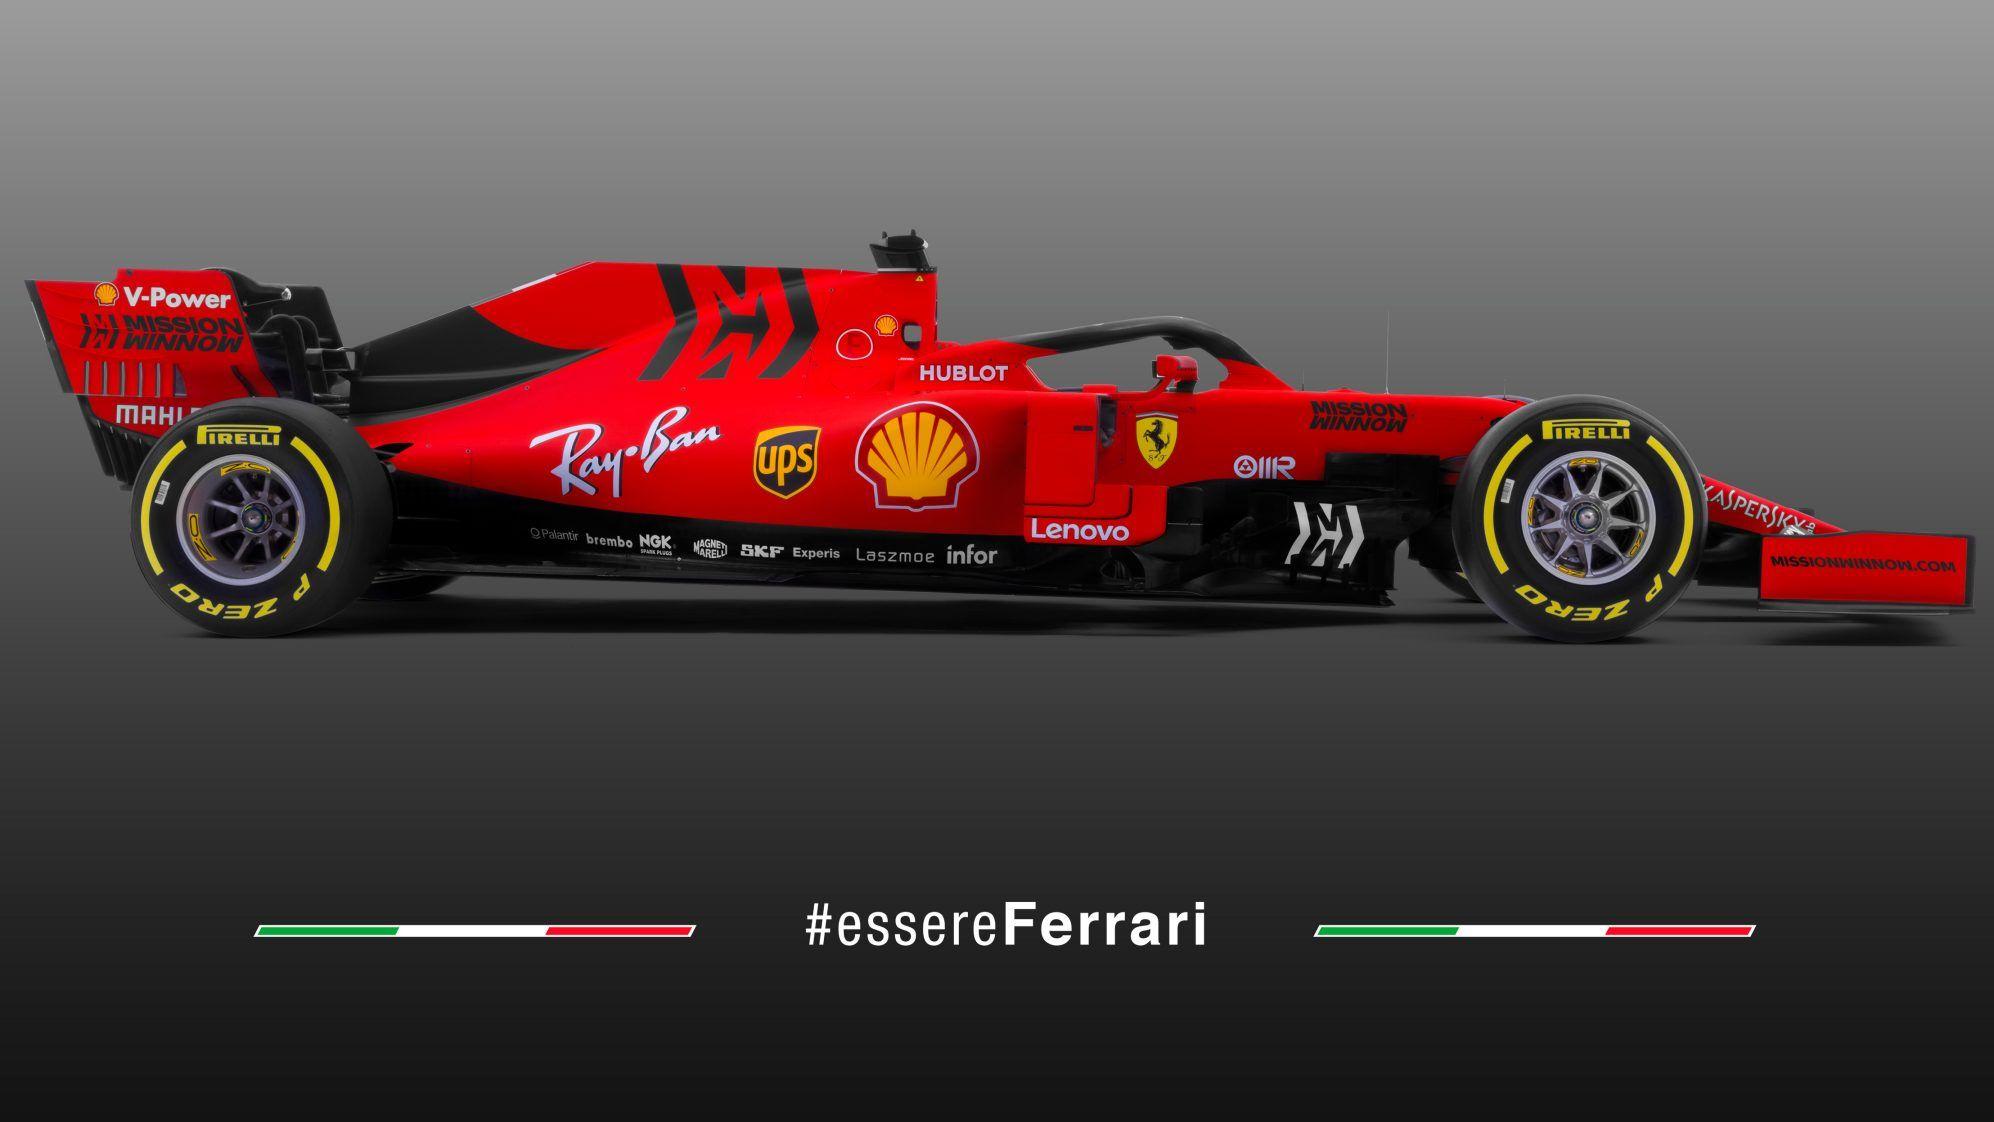 Ferrari Sf90  All The Angles Of The 2019 F1 Car